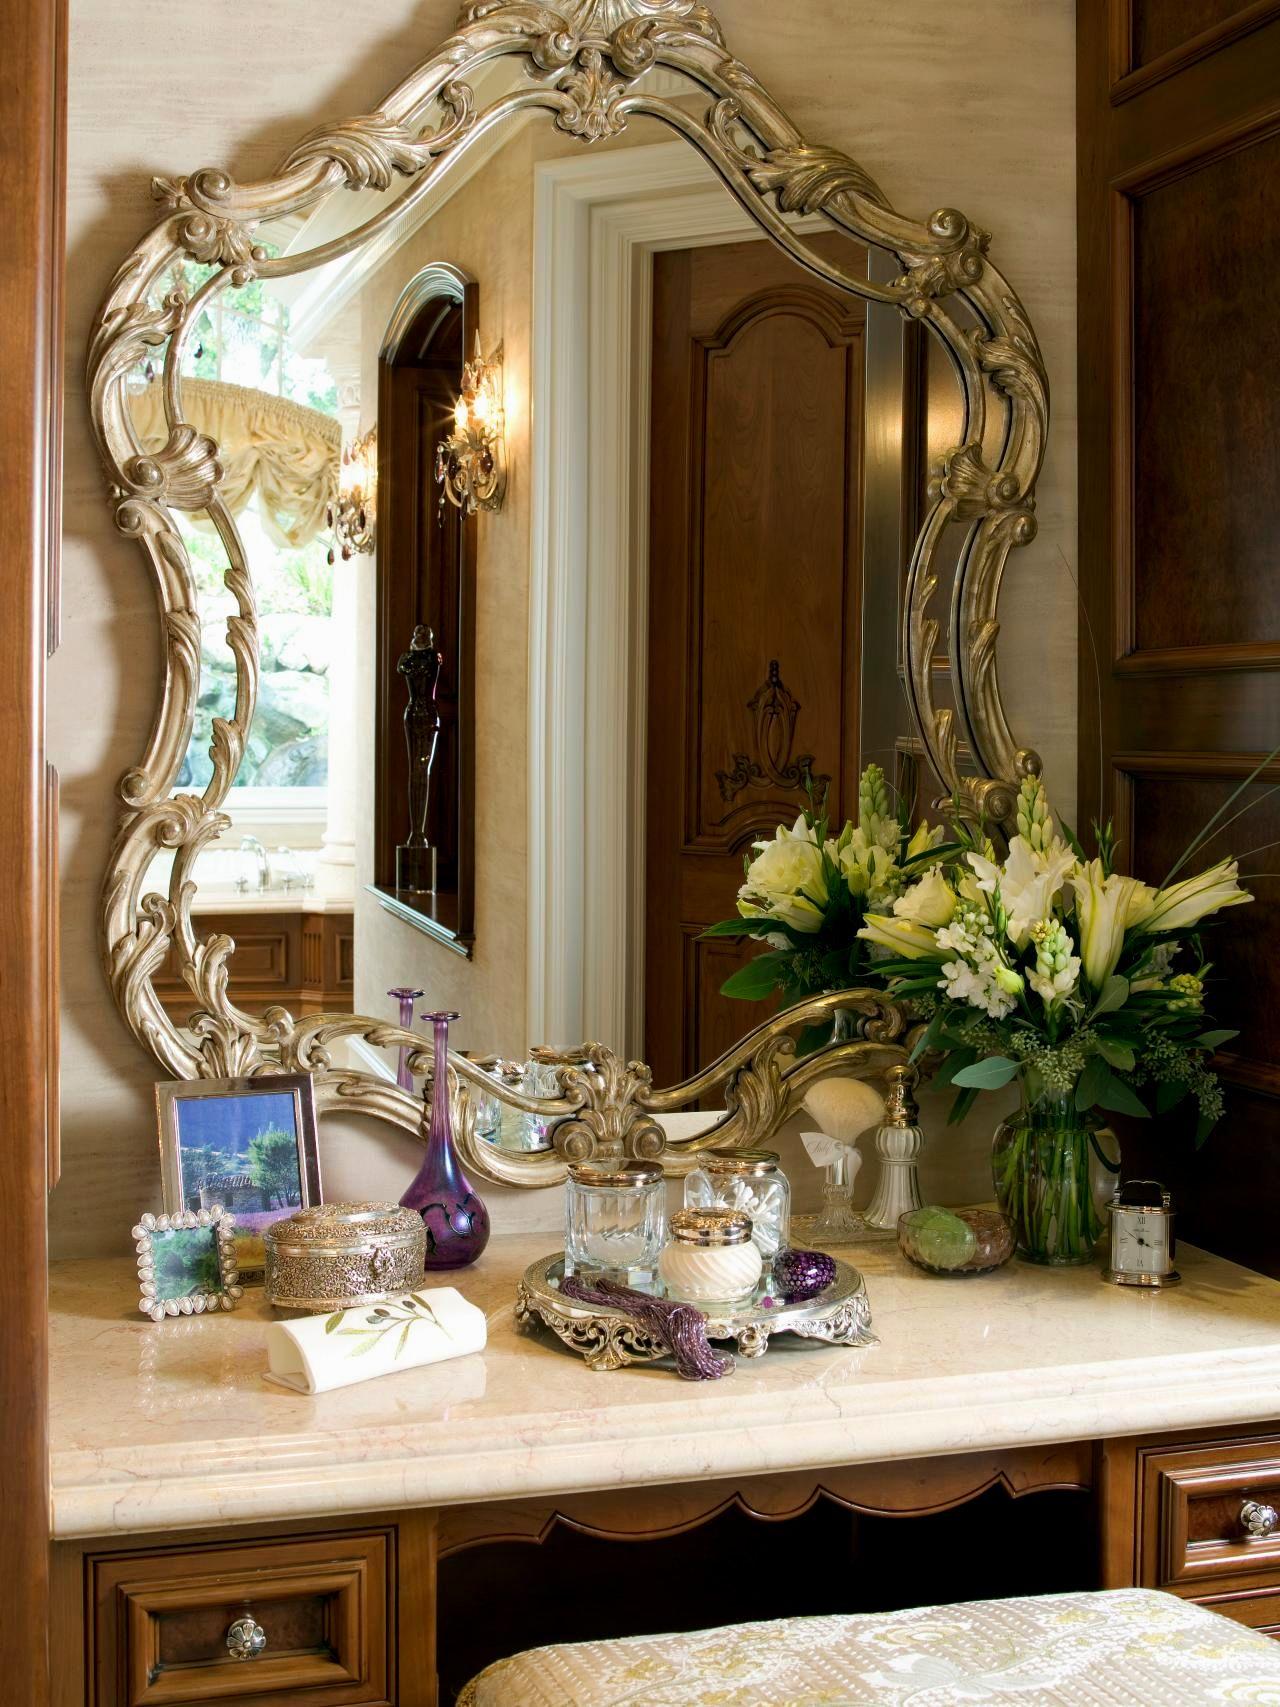 elegant white bathroom vanities decoration-Luxury White Bathroom Vanities Image